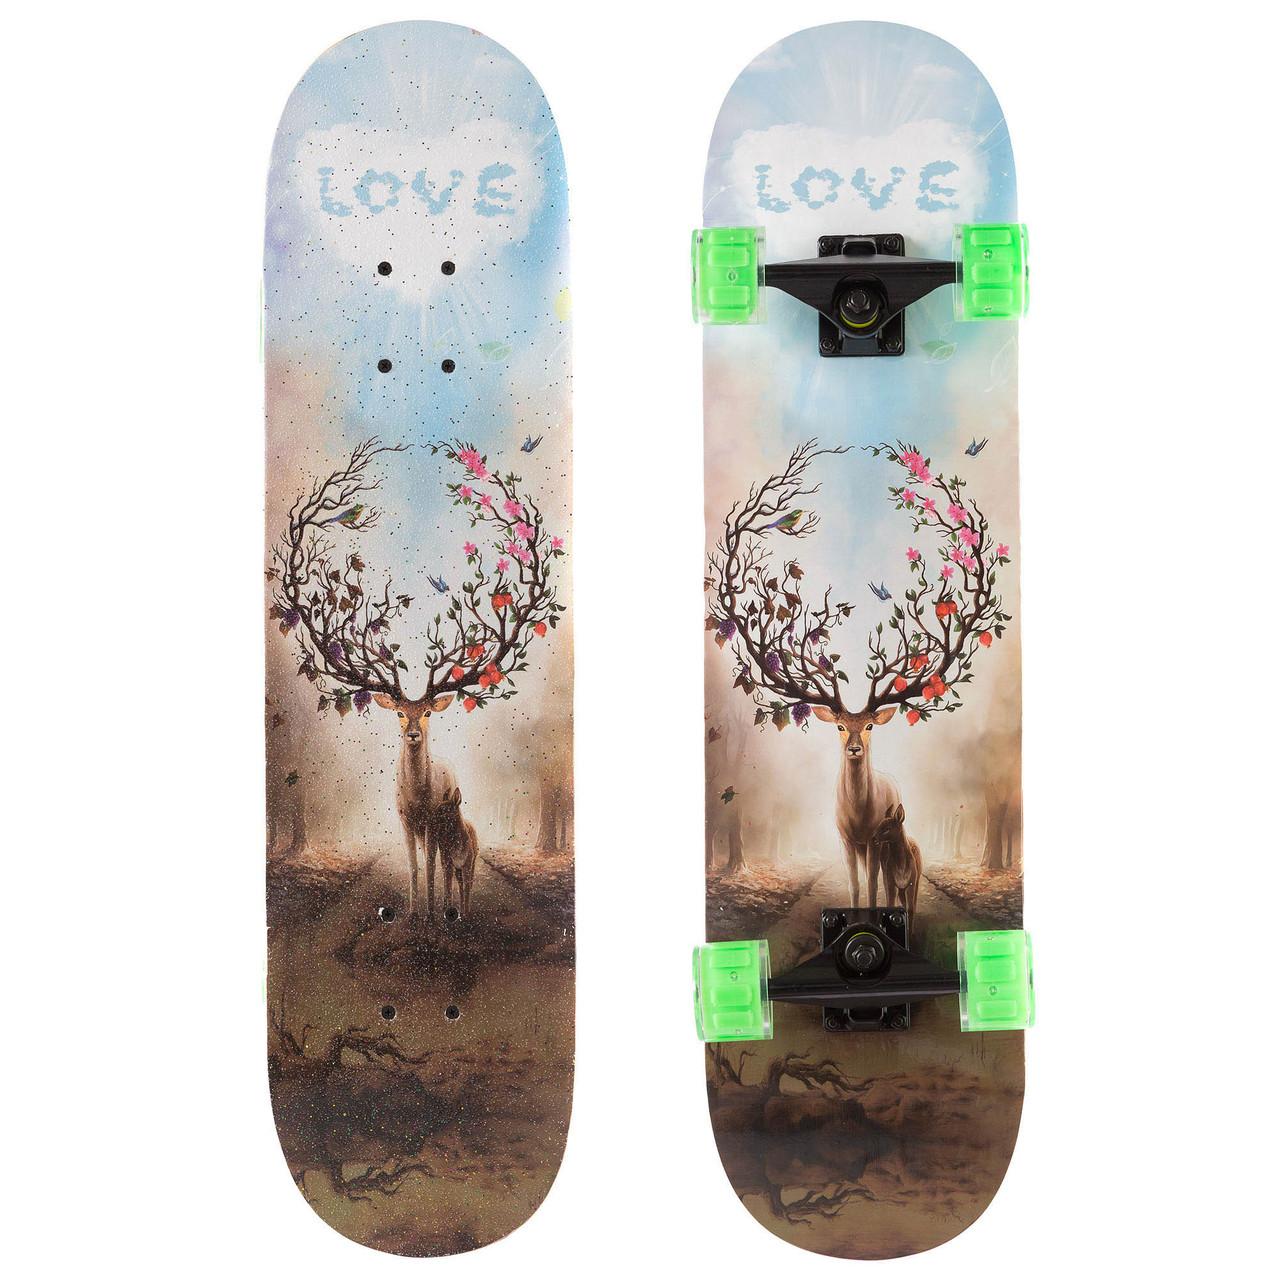 Скейт класичний з малюнком Олень SK-1248-5